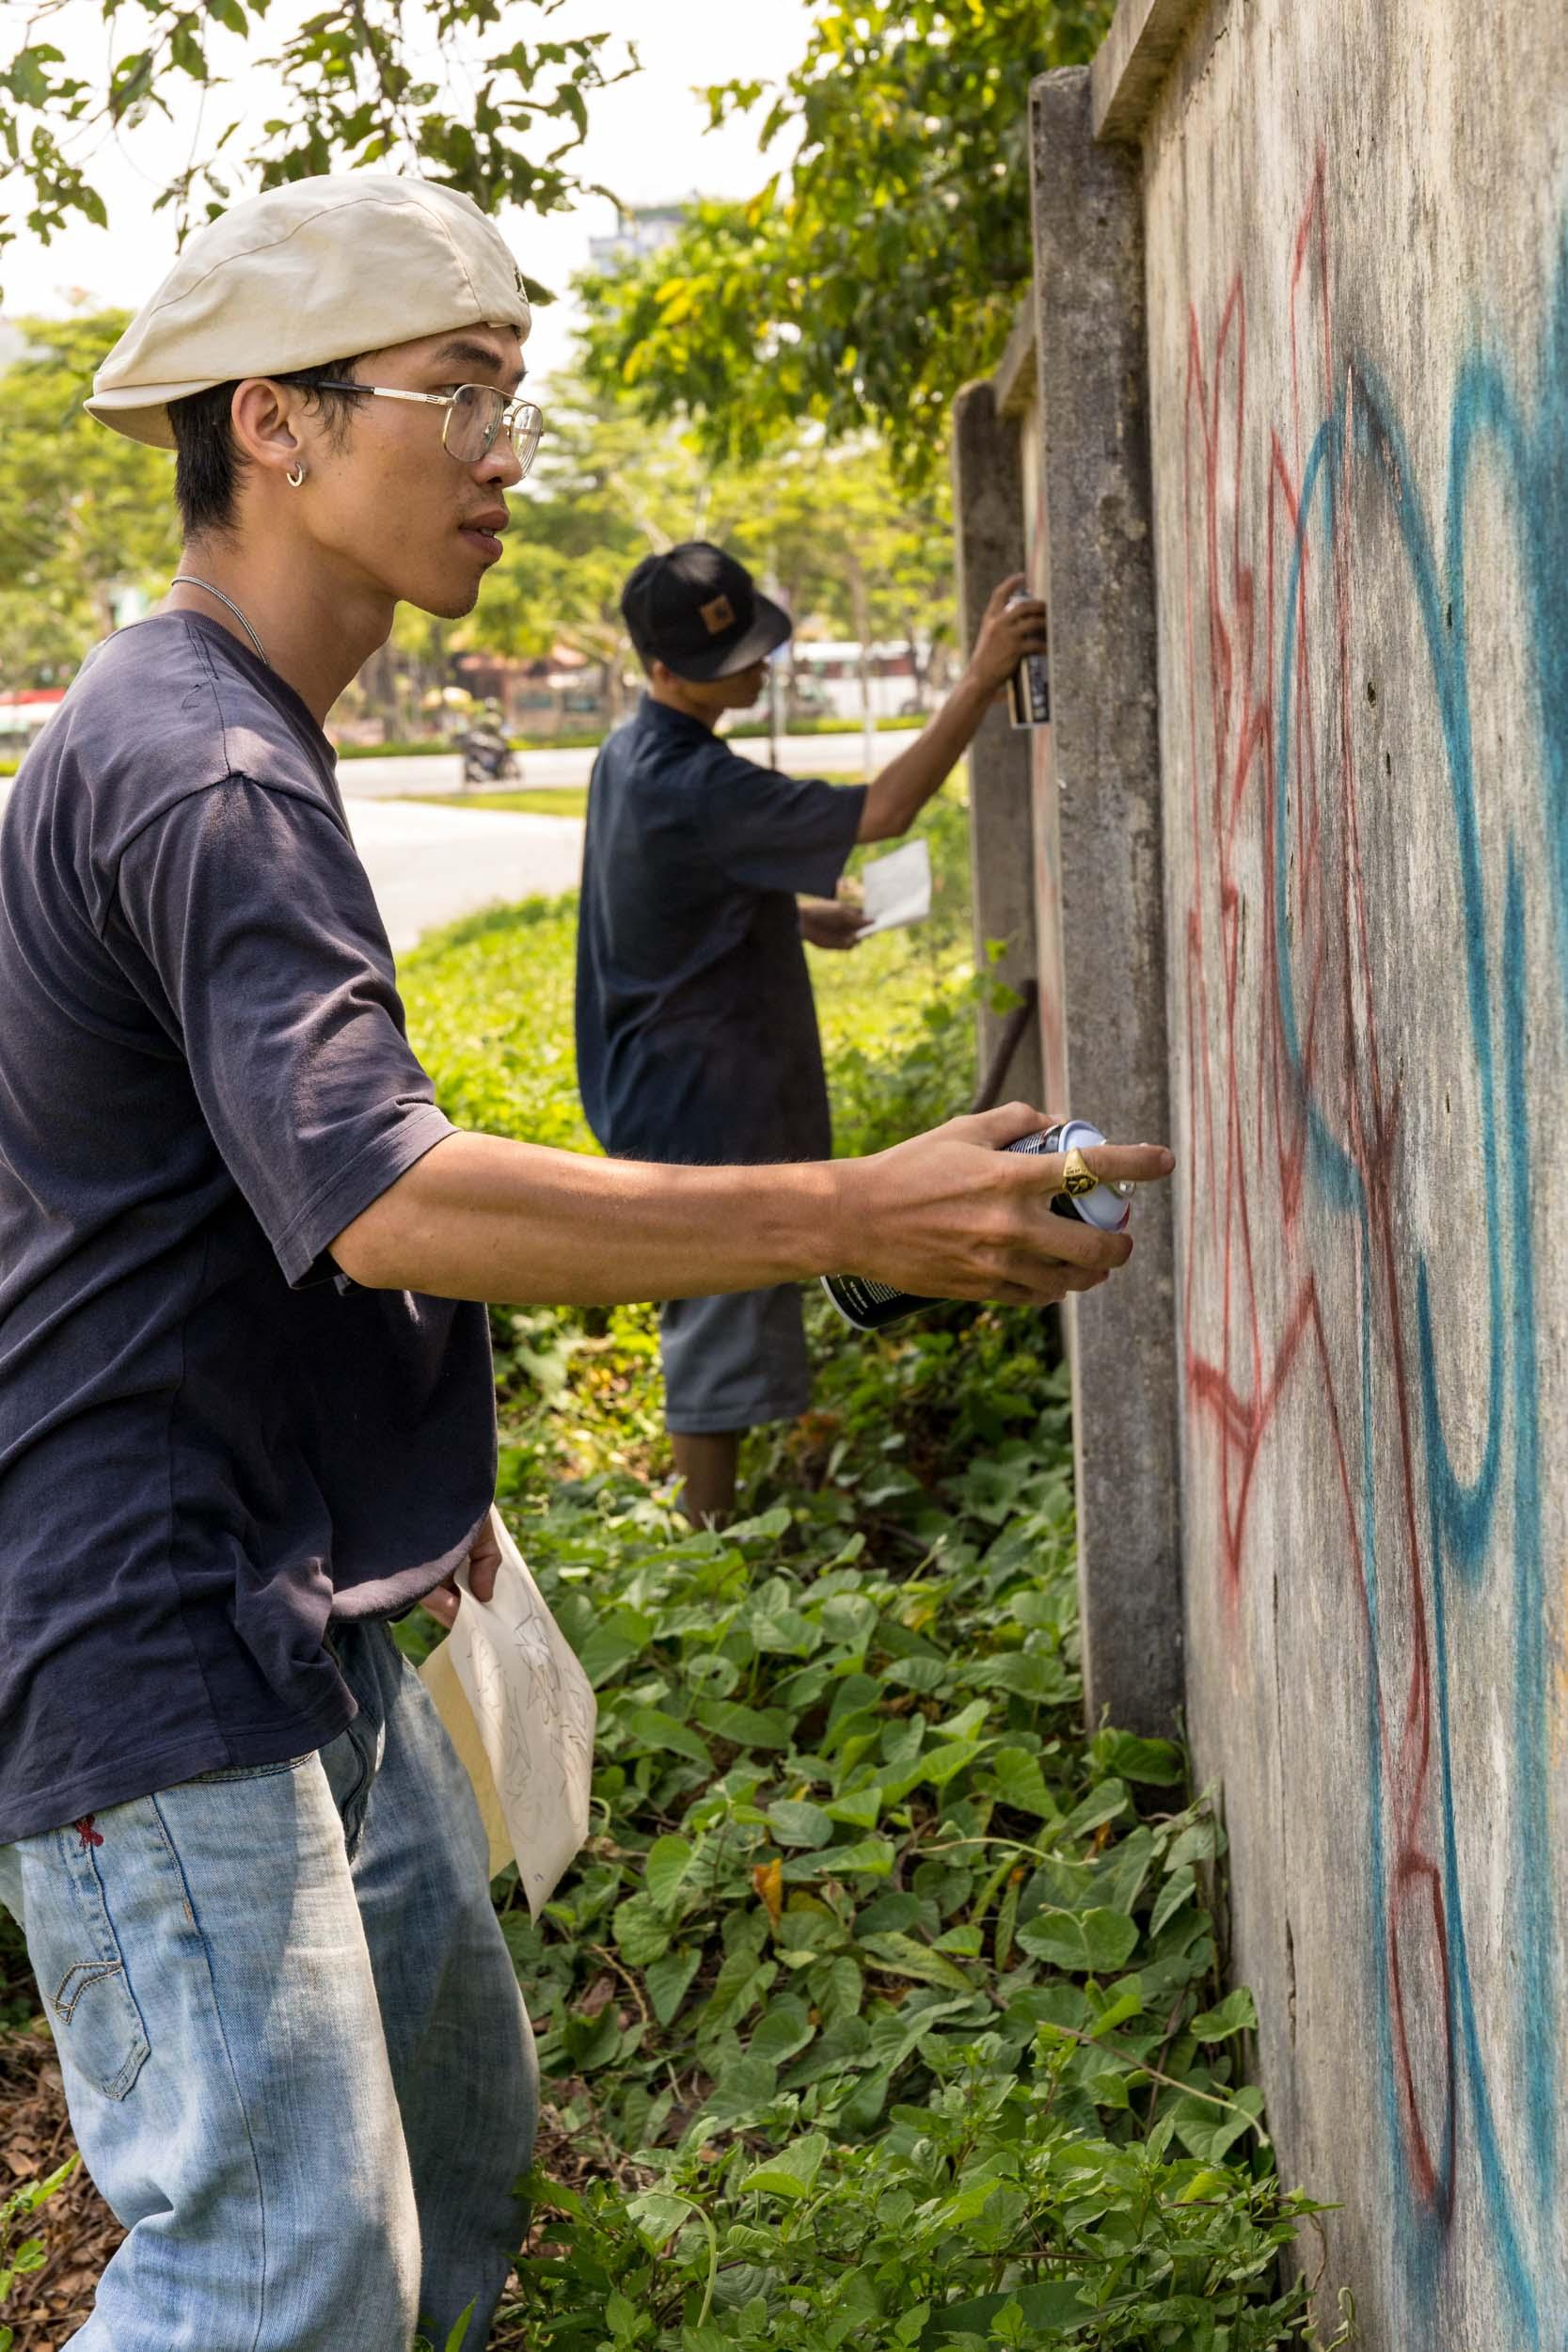 Graffiti Artists in Action in Da Nang City Centre, Vietnam.